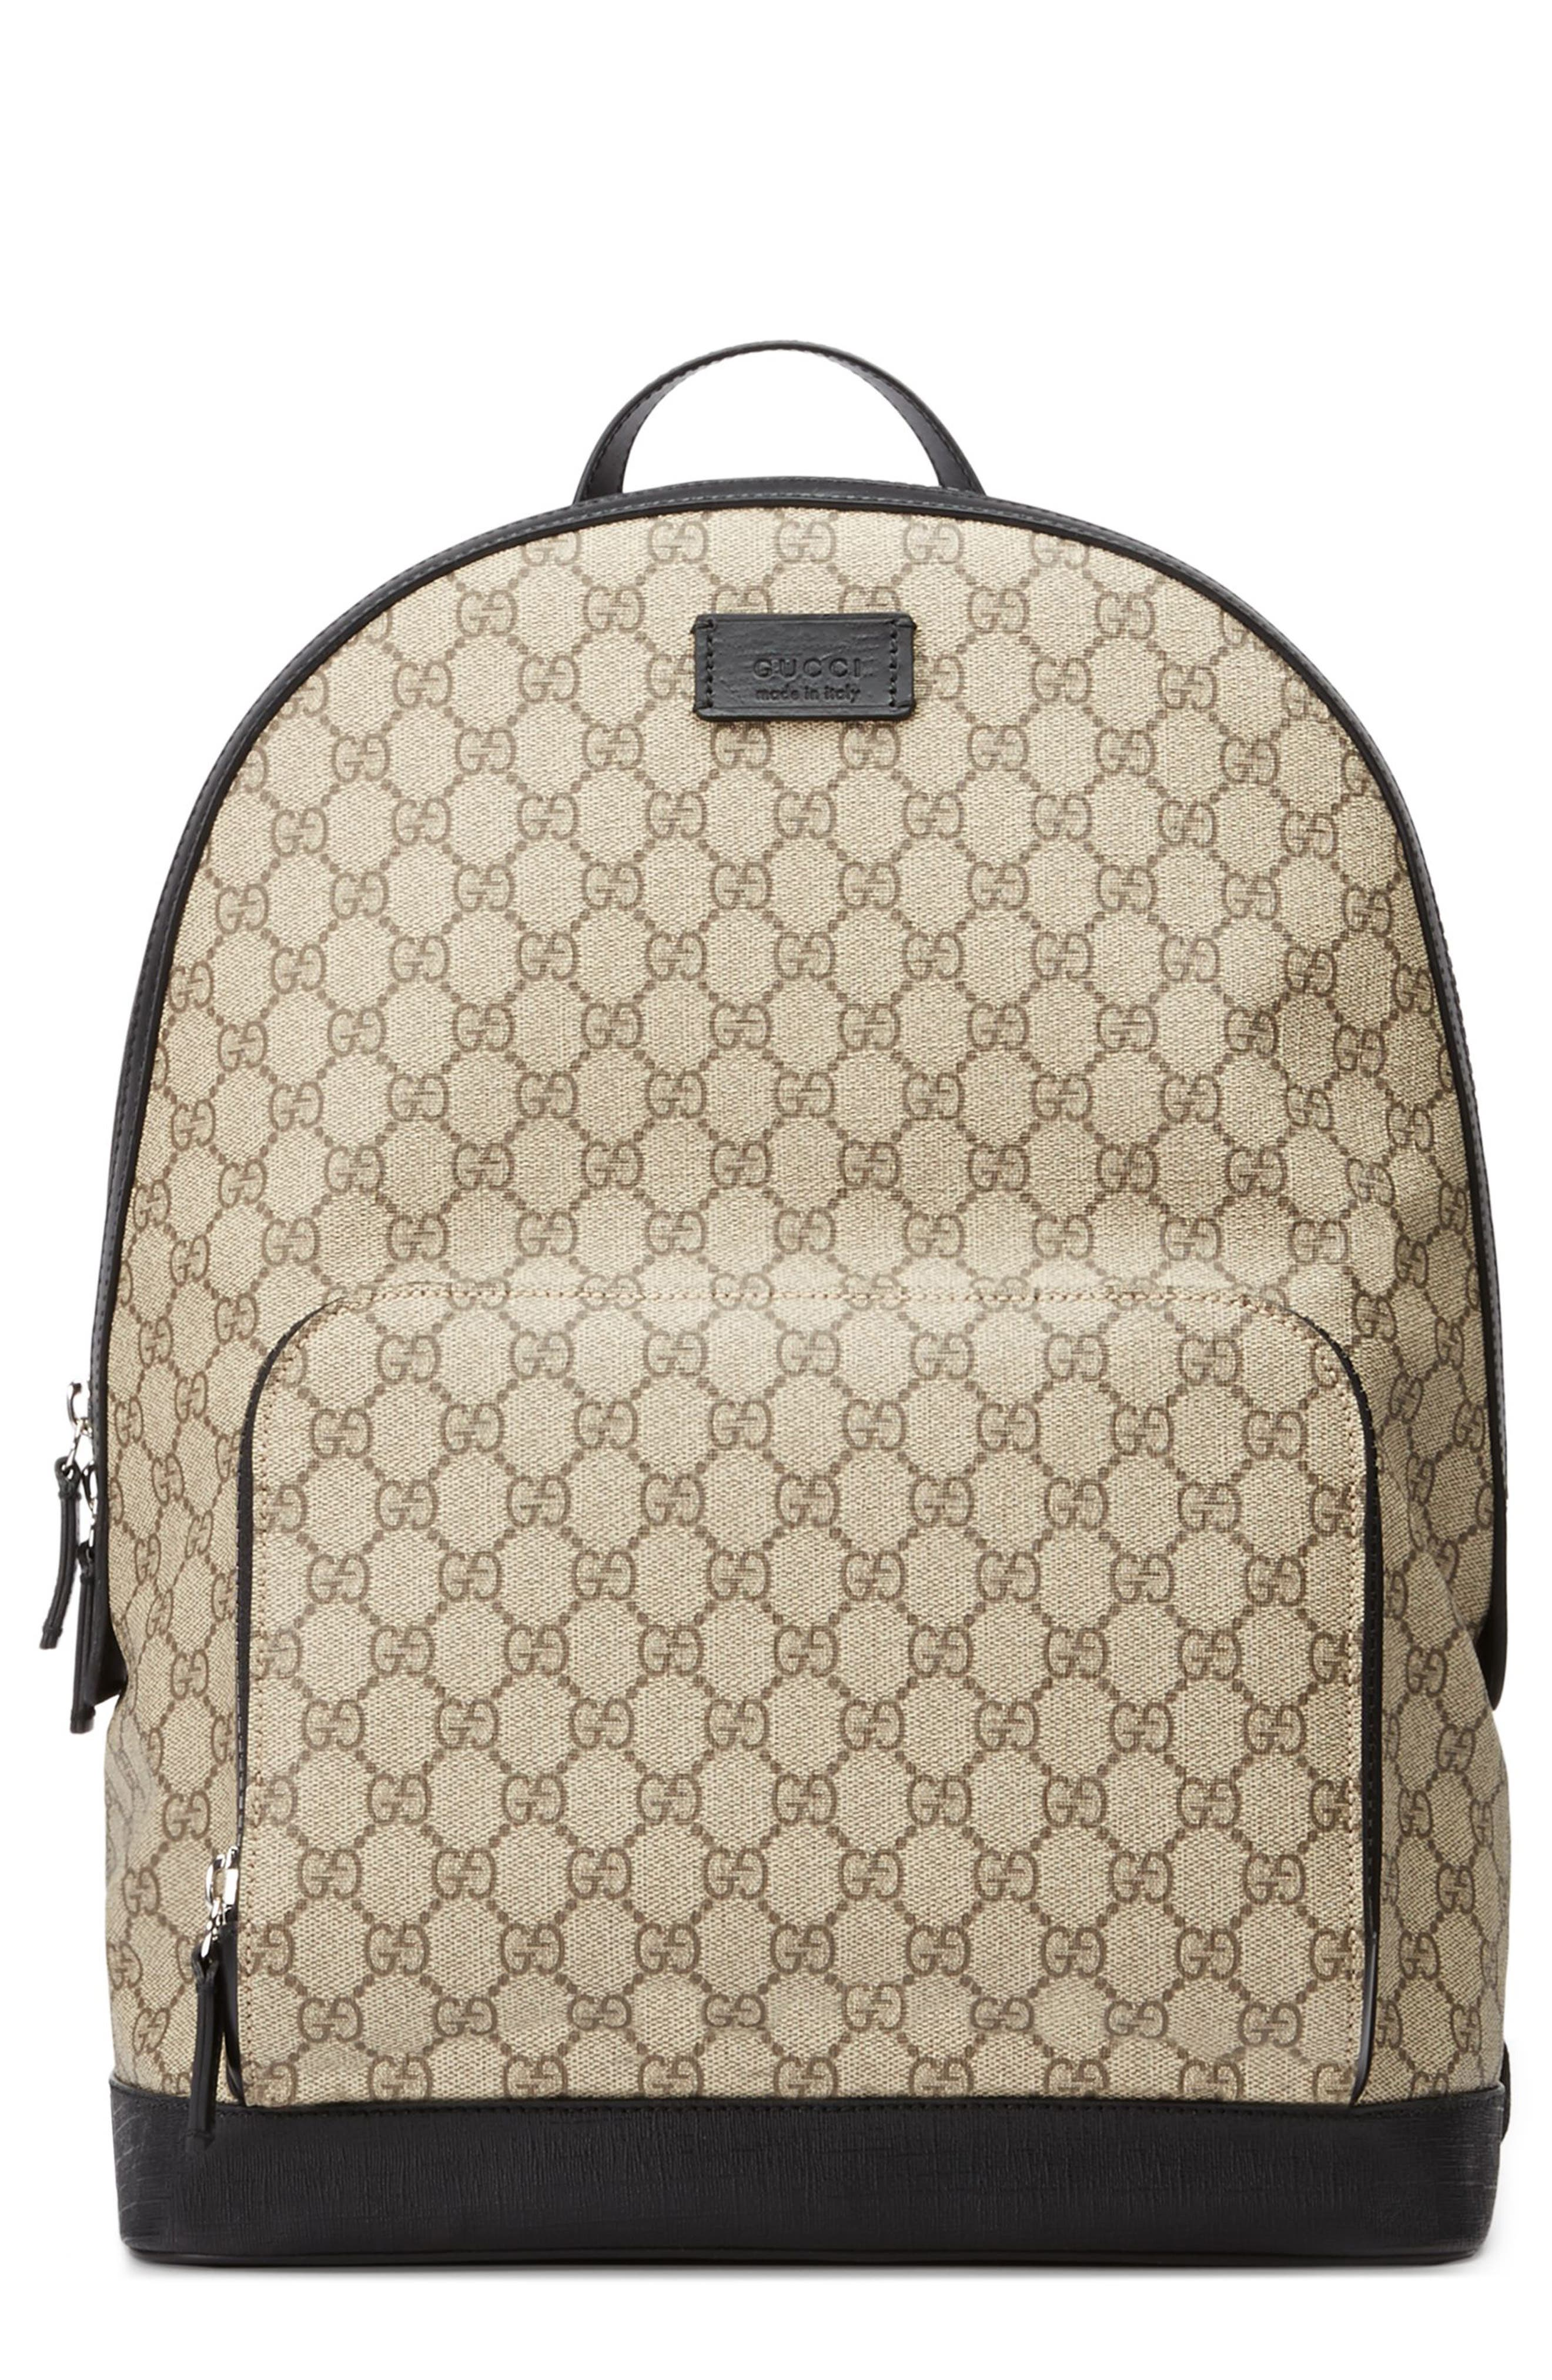 d4a90e3ab10a62 Gucci Gg Supreme Print Backpack, Beige | ModeSens